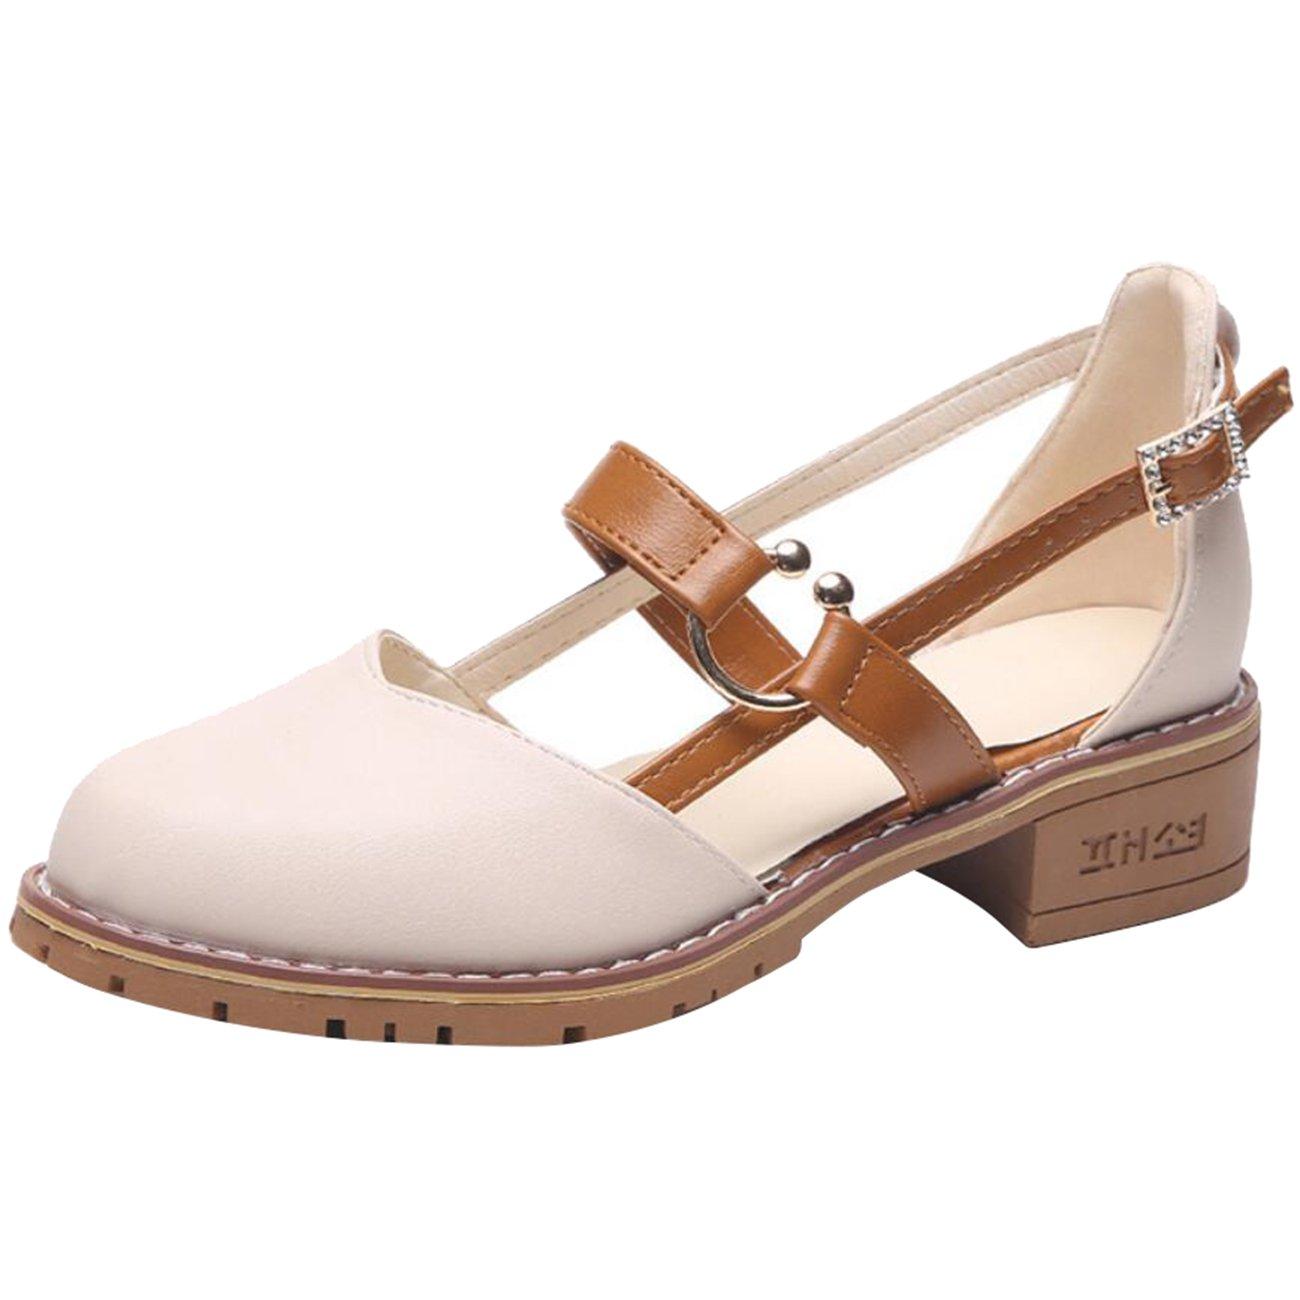 Mashiaoyi Womens Round-Toe Block-Heel Buckle Metal Diamond Sandals